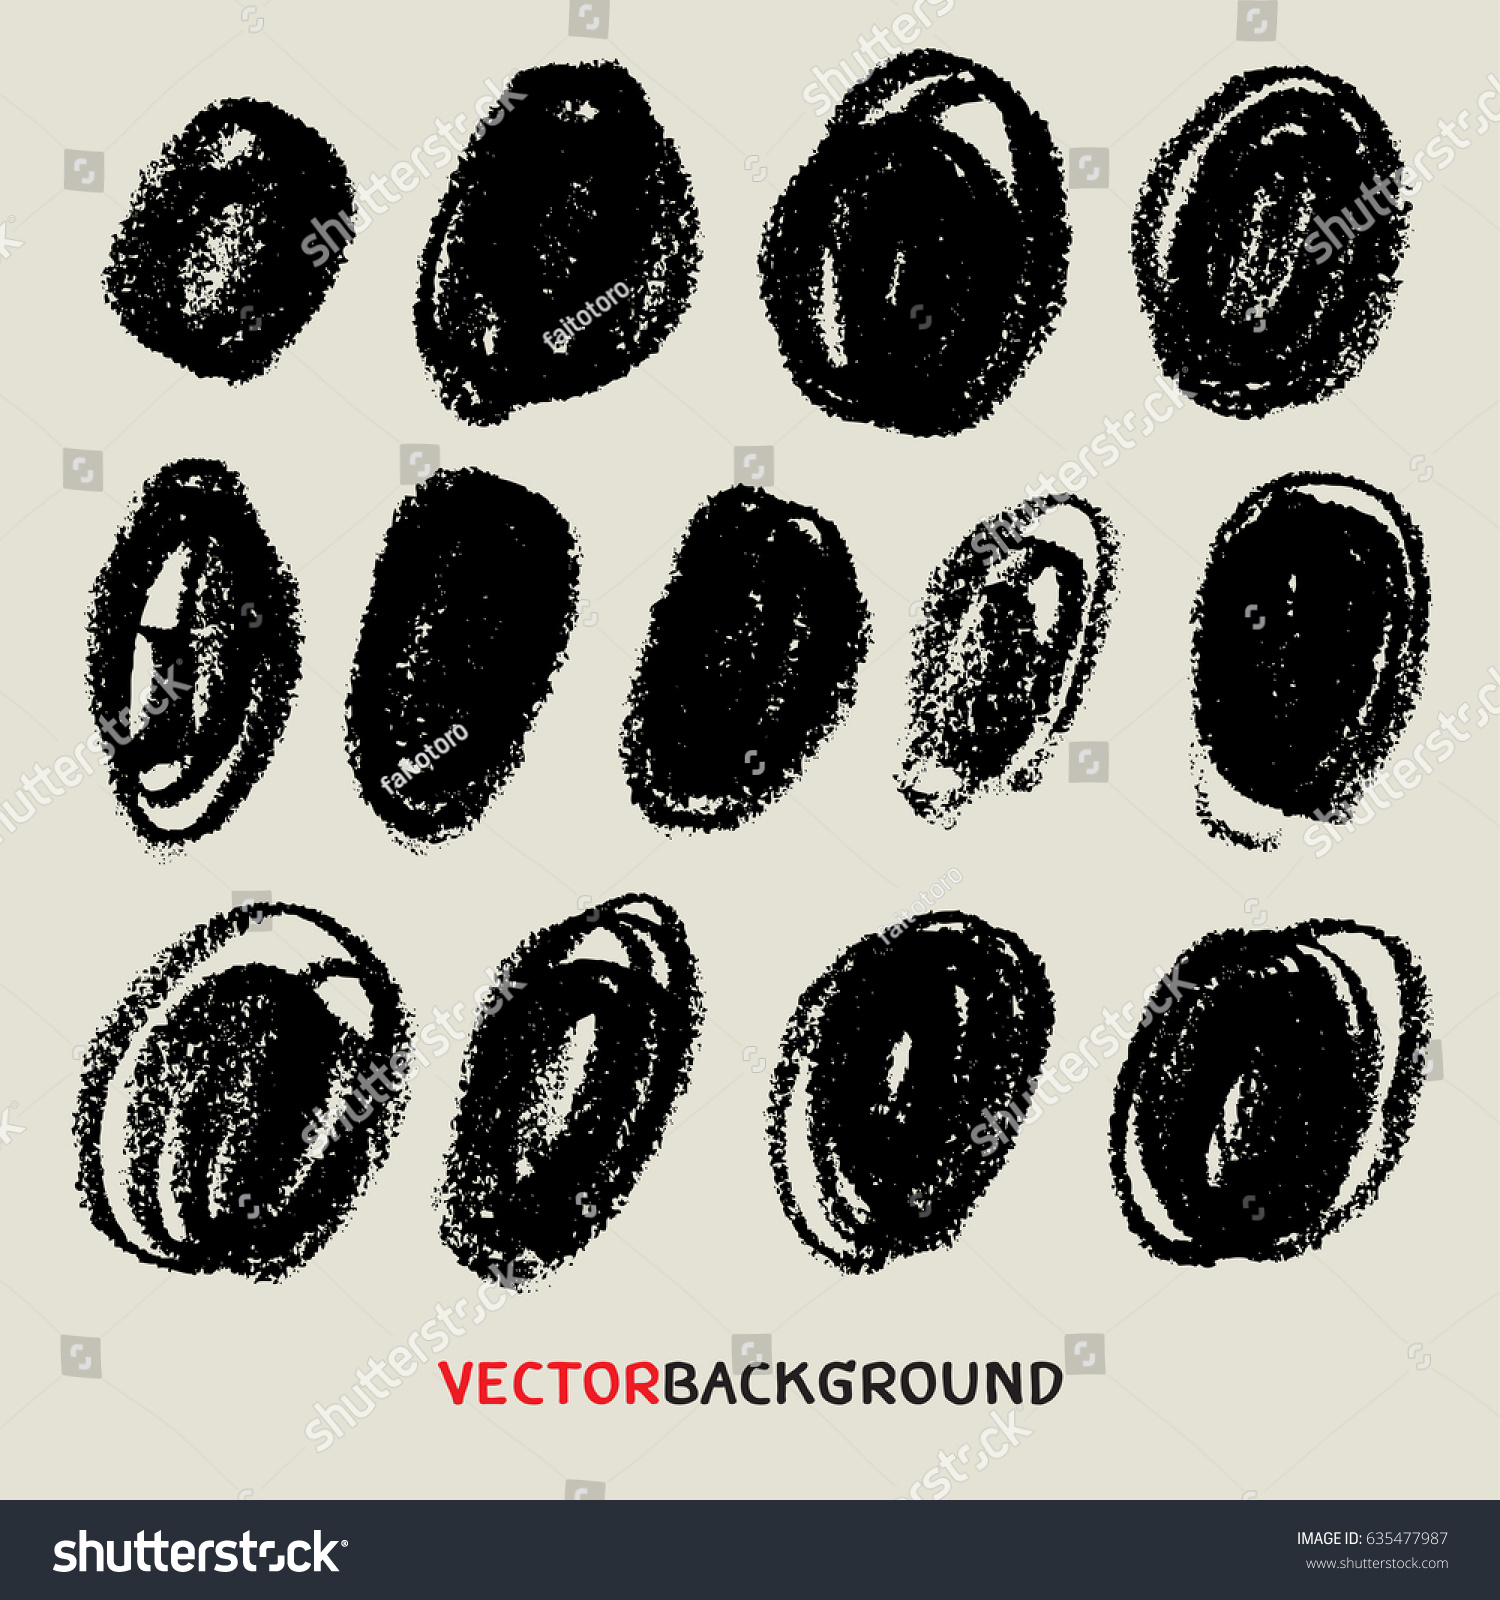 Chalk Texture Background Templatecrayon Doodle Sketch Stock Photo ...